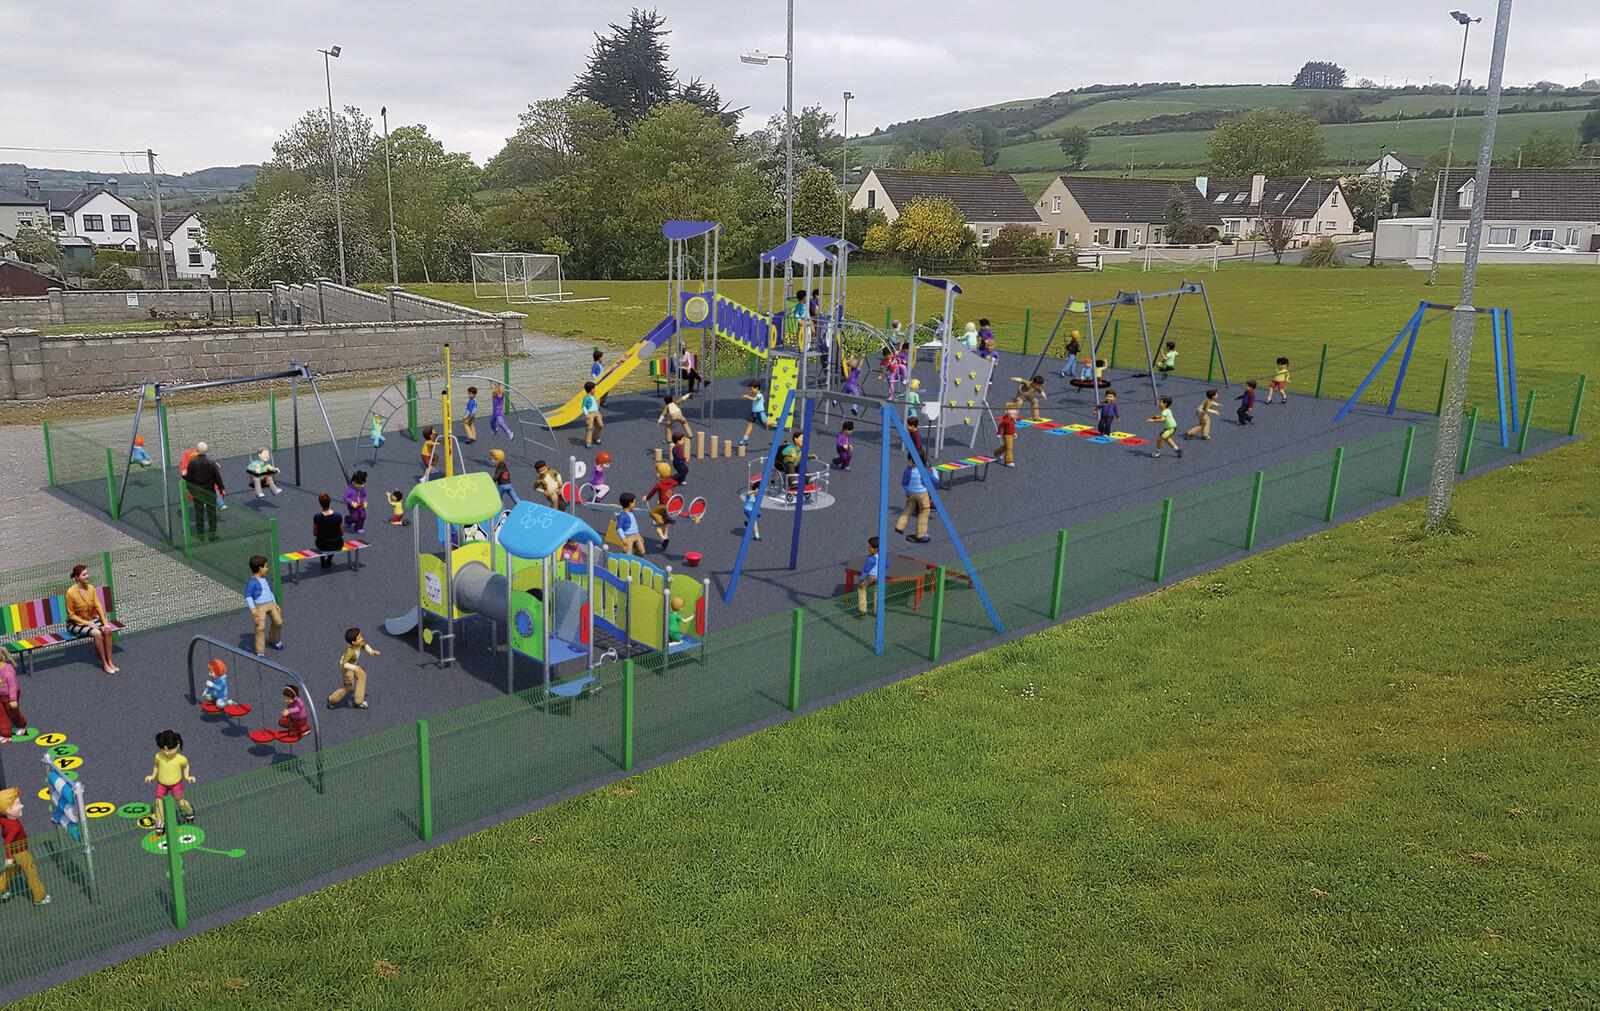 Playground montage view 2